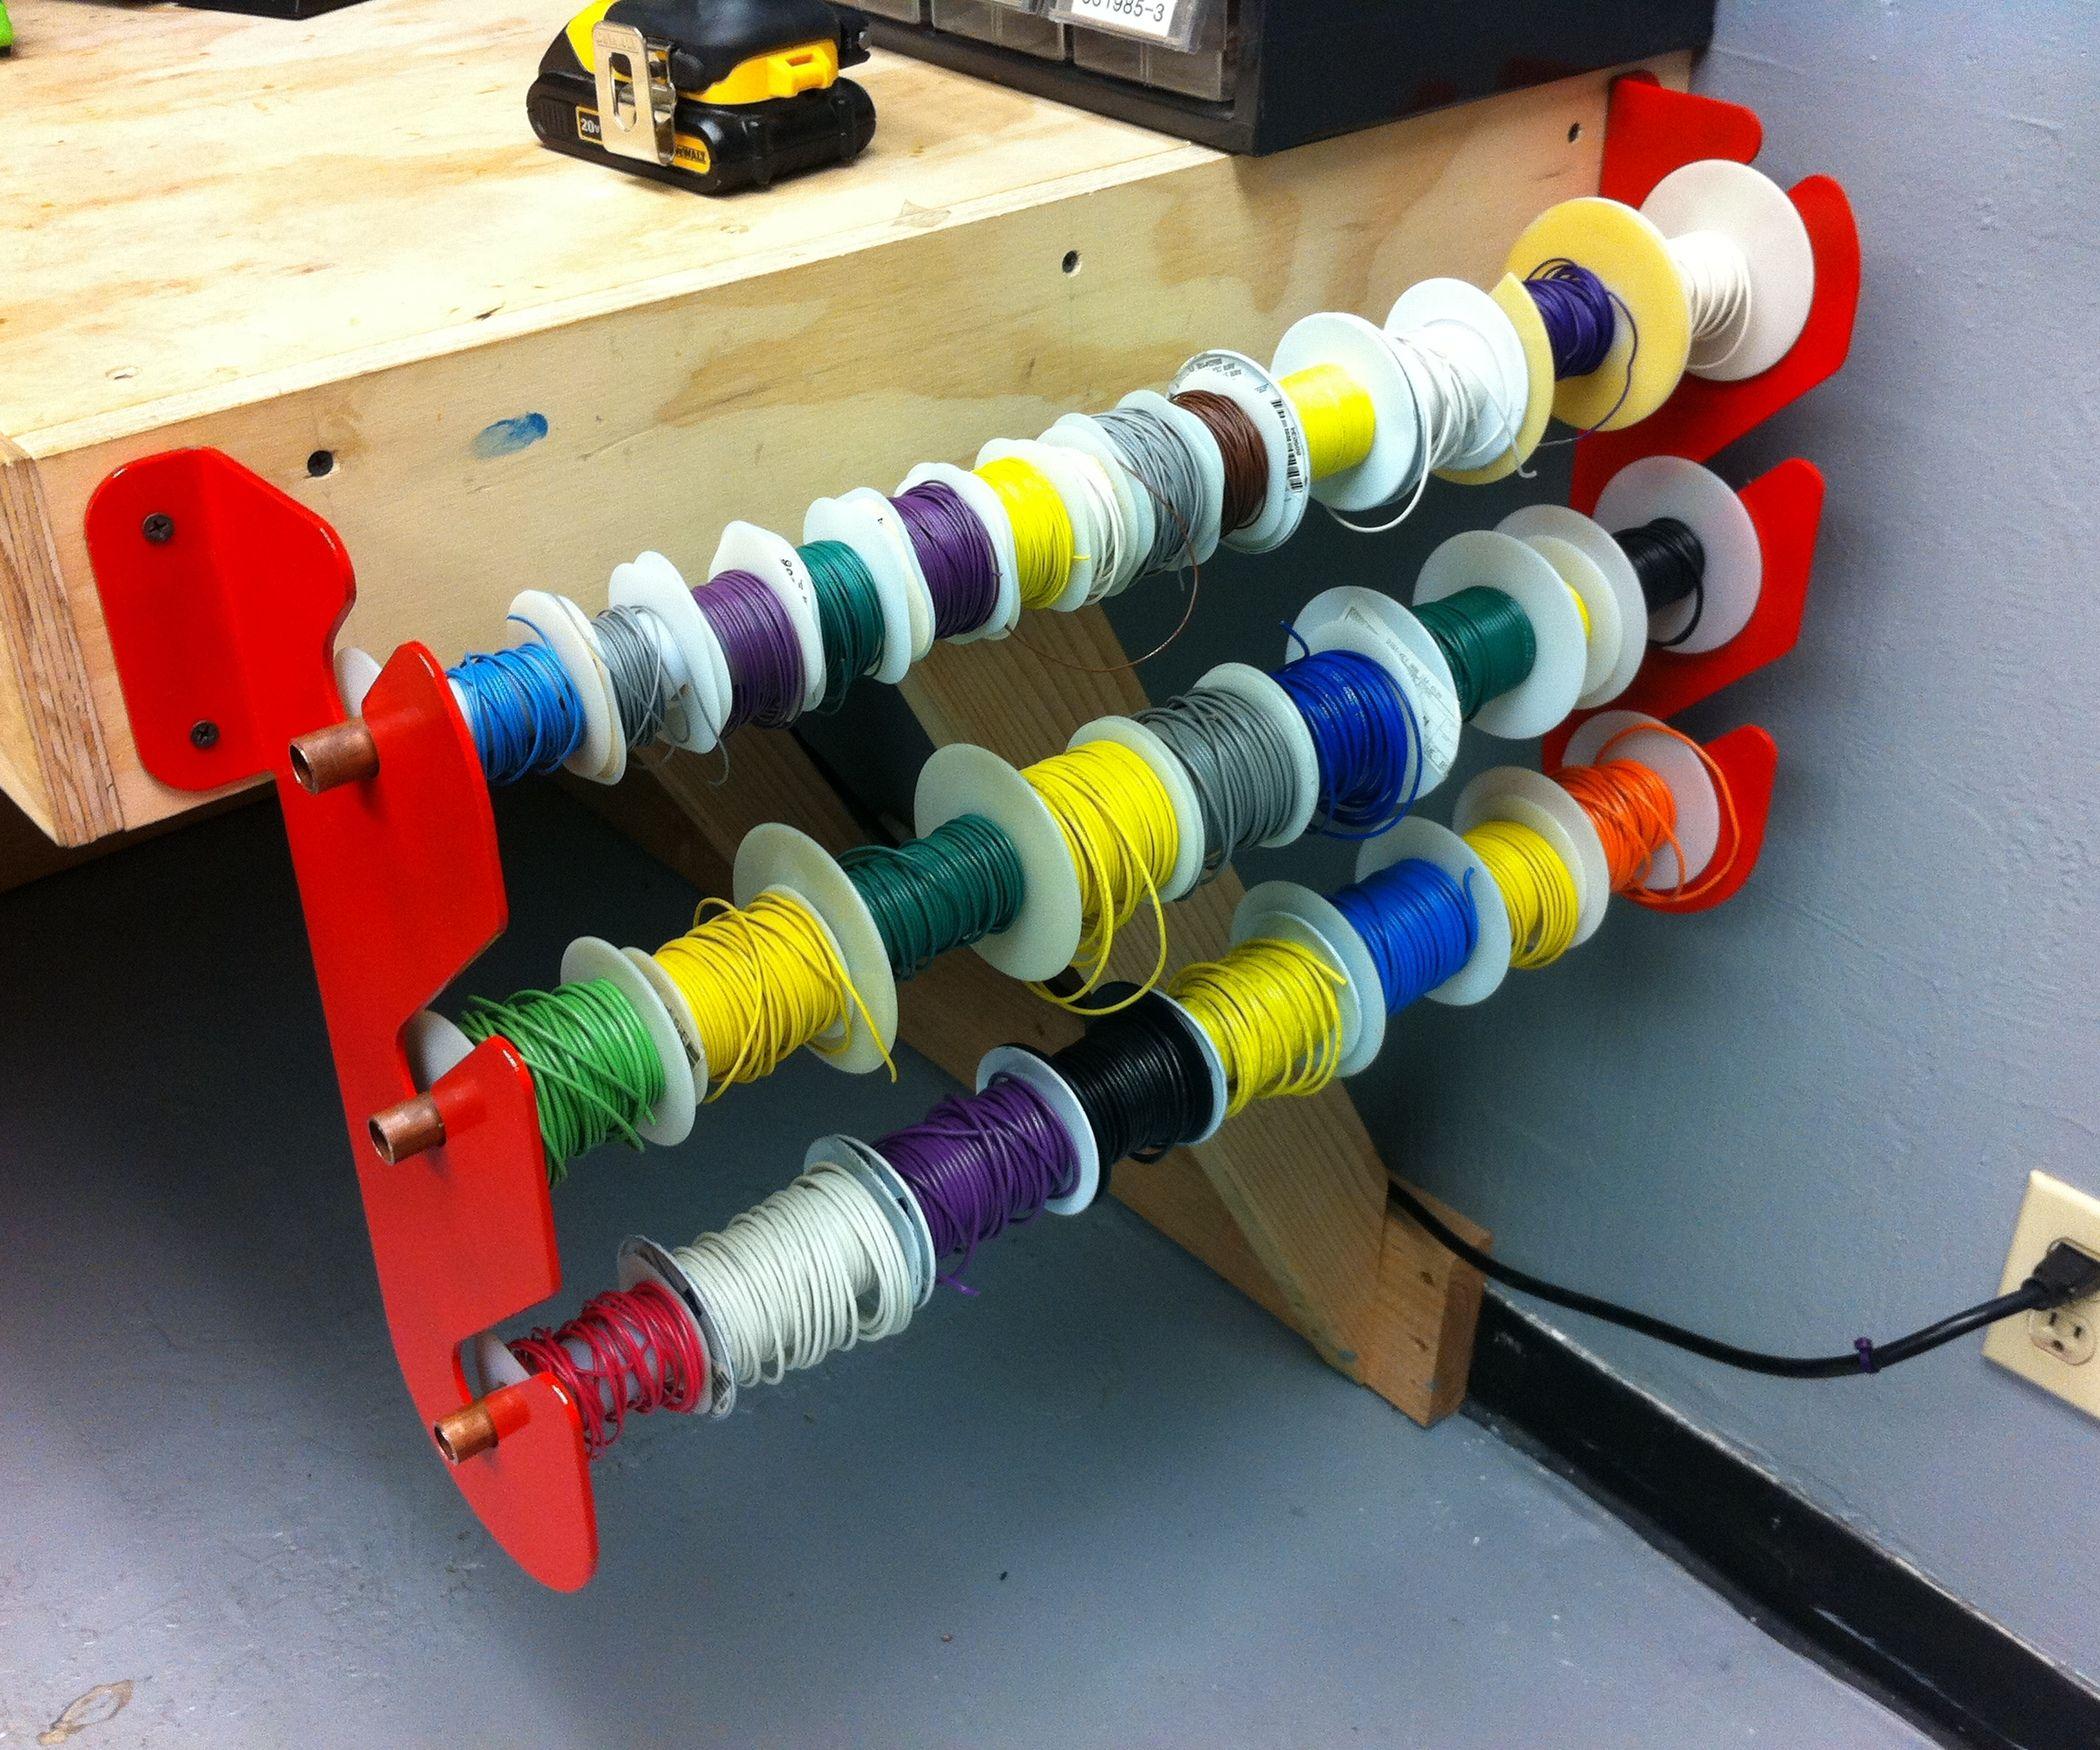 How to Make a Wire Rack | Brett Stuff | Pinterest | Wire racks, Shop ...